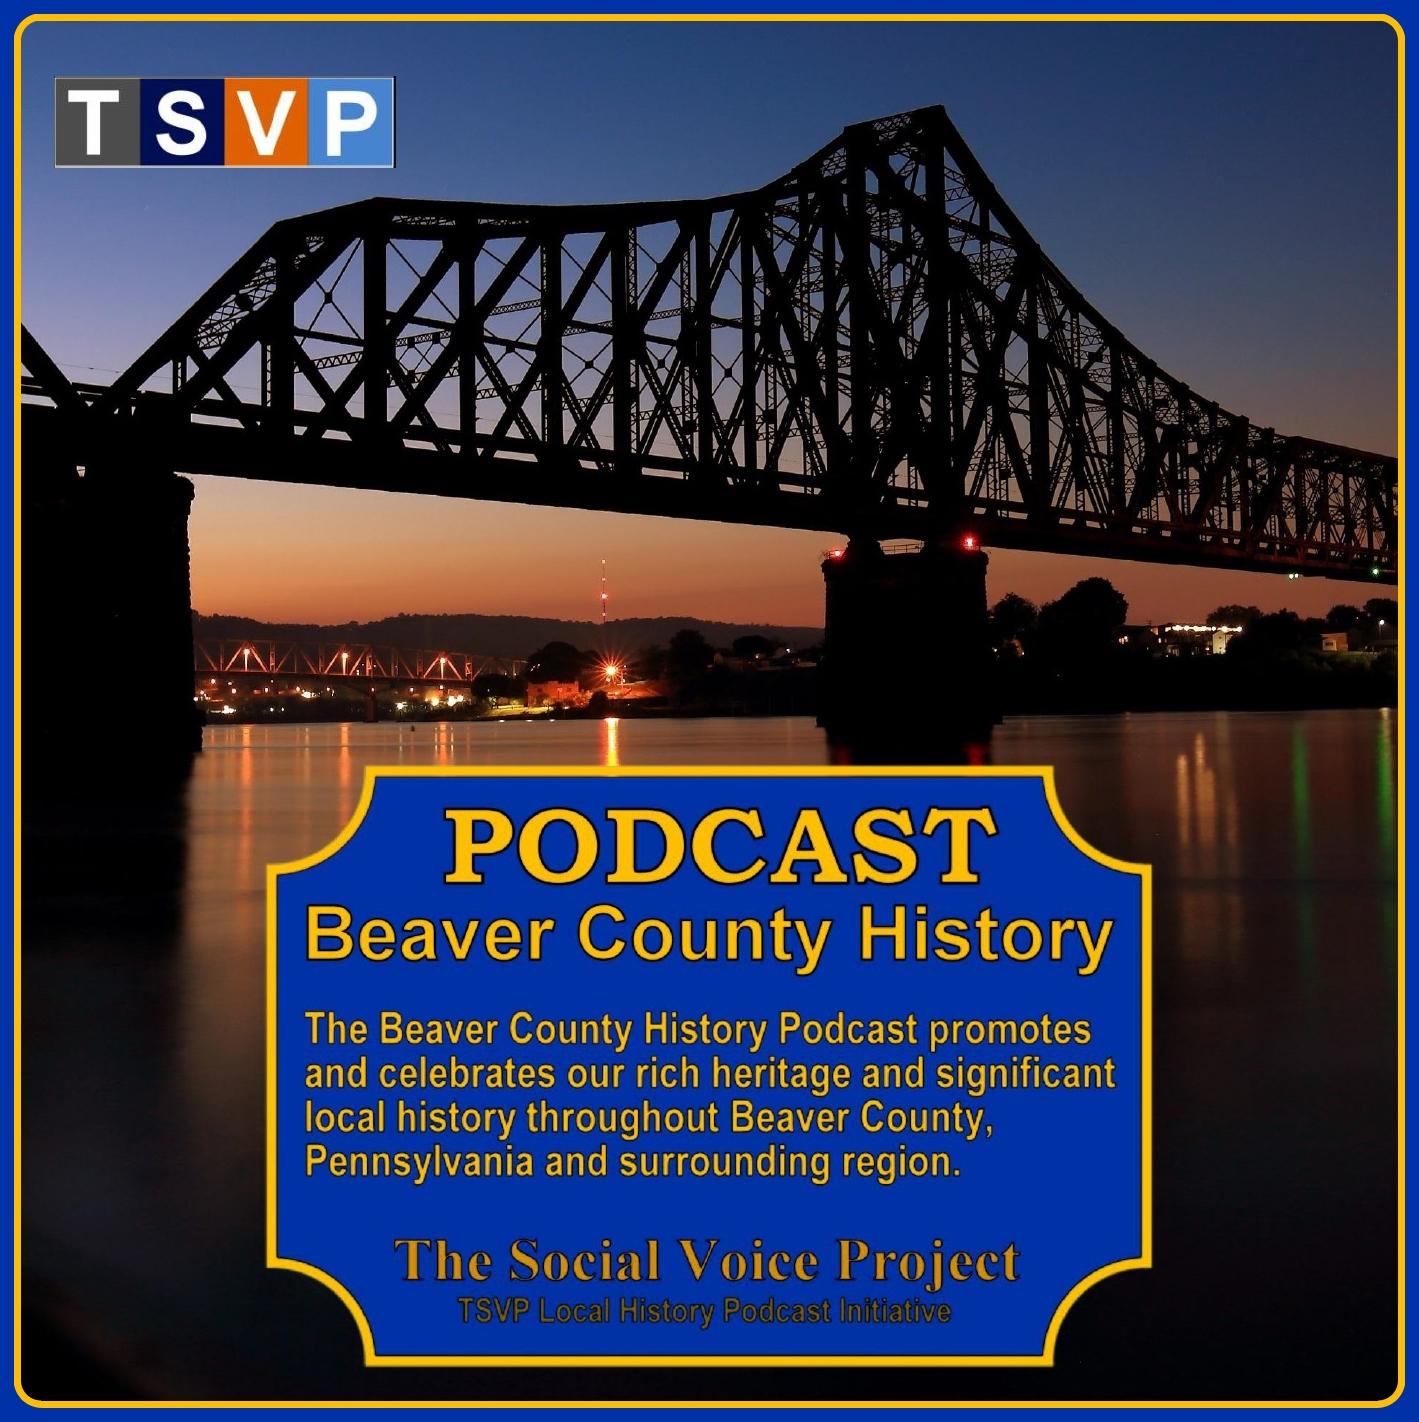 Beaver County History Podcast